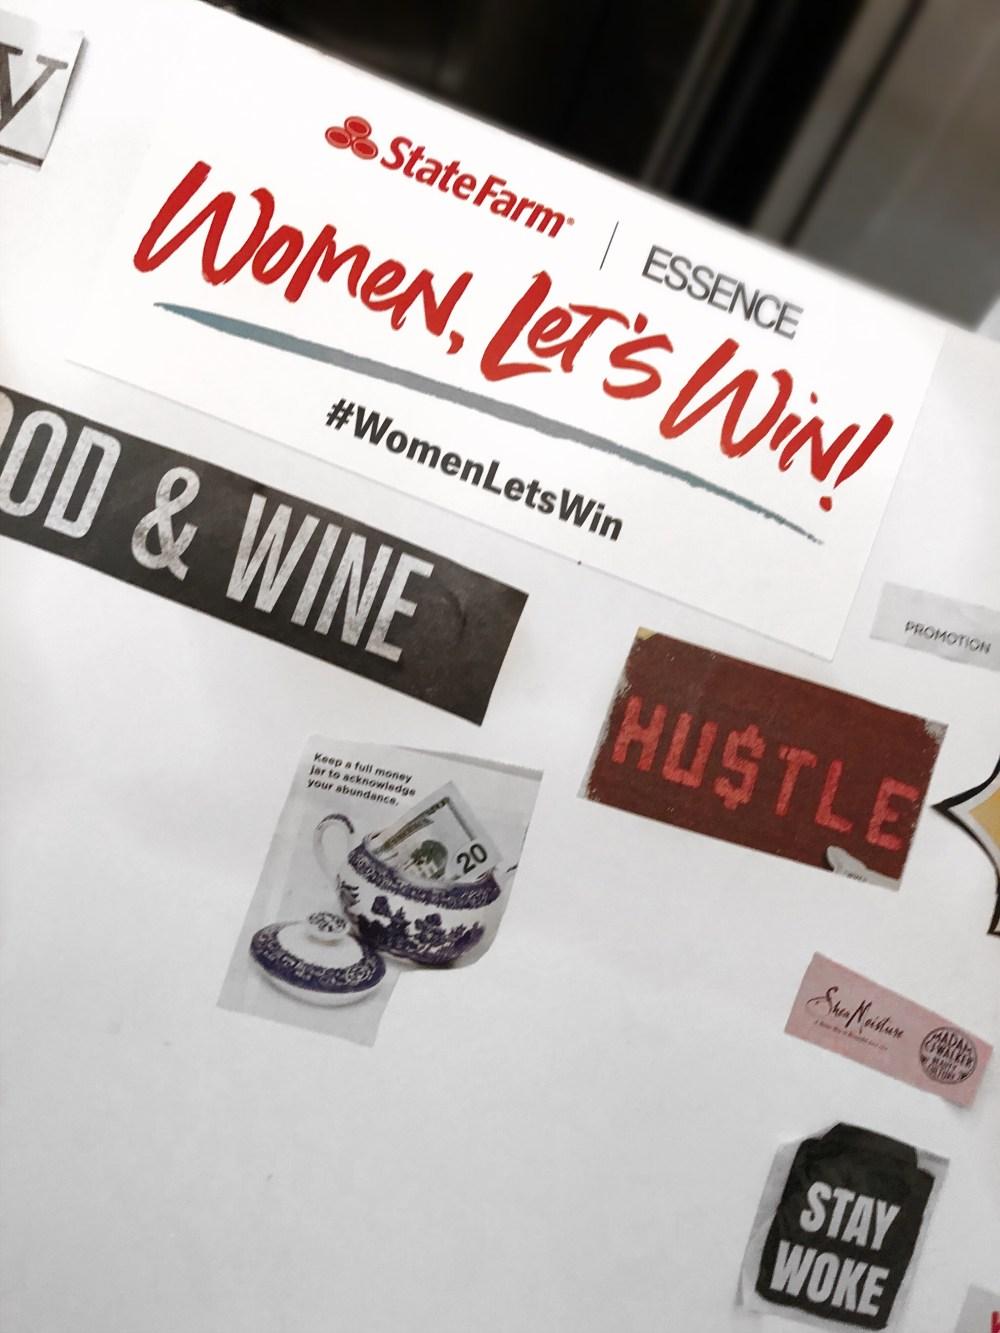 STATE FARM & ESSENCE #WOMENLETSWIN EVENT CHICAGO, State Farm, Essence, #womenletswin, womenletswin, chicago event, chicago, Chicagoblogger, Chicago media